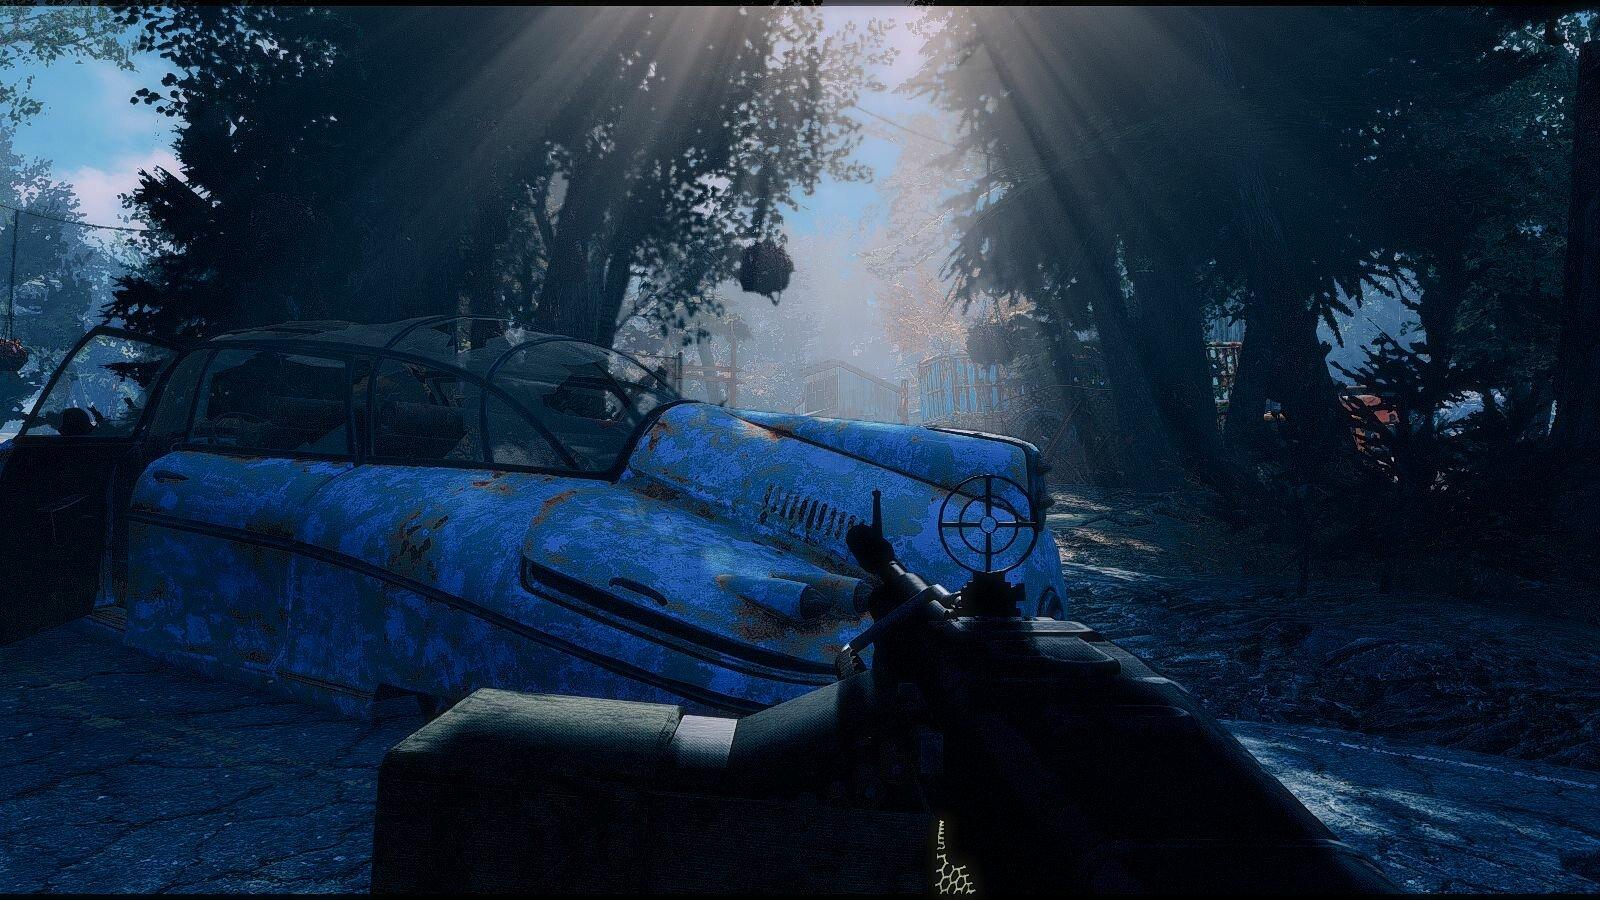 Пейзажик.. Fallout-4 (Сборка 6.5)